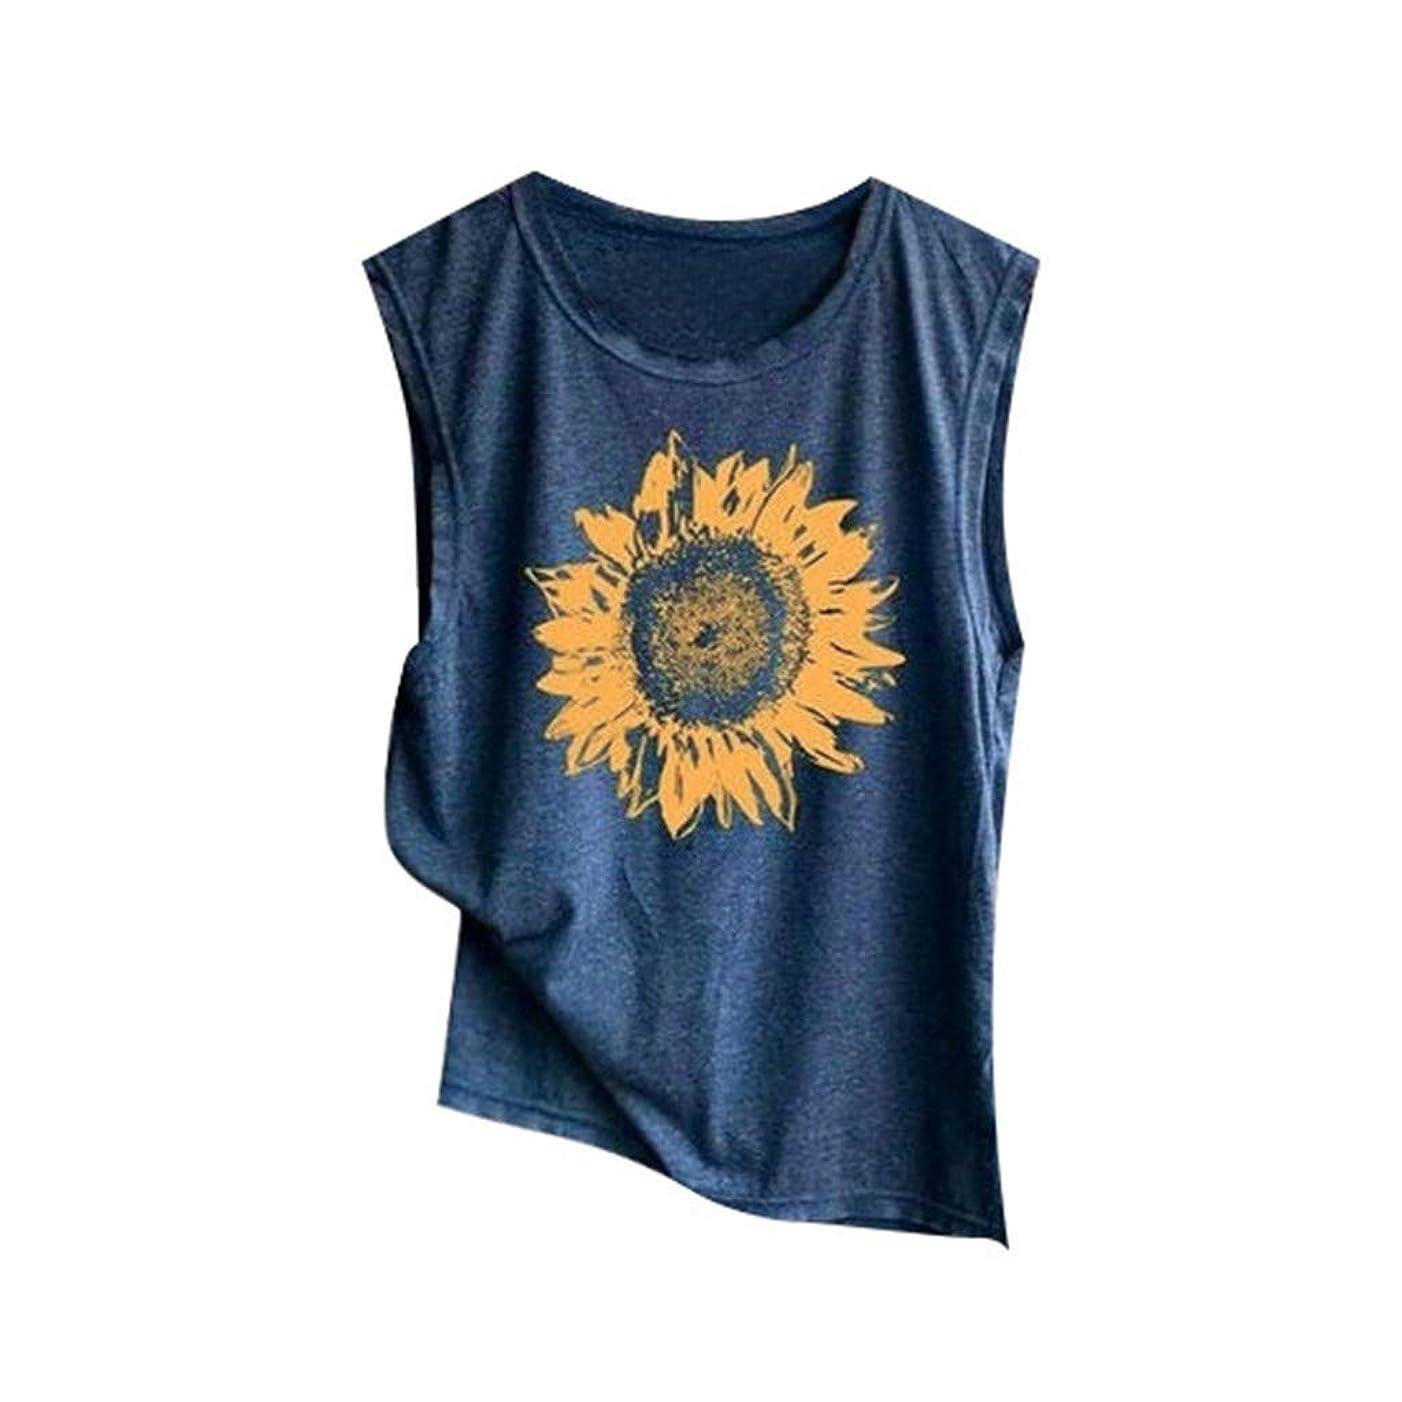 Sunflower Printed Tank Tops - YOMXL Womens Crew Neck Sleeveless Vest Boyfriend Style Tee